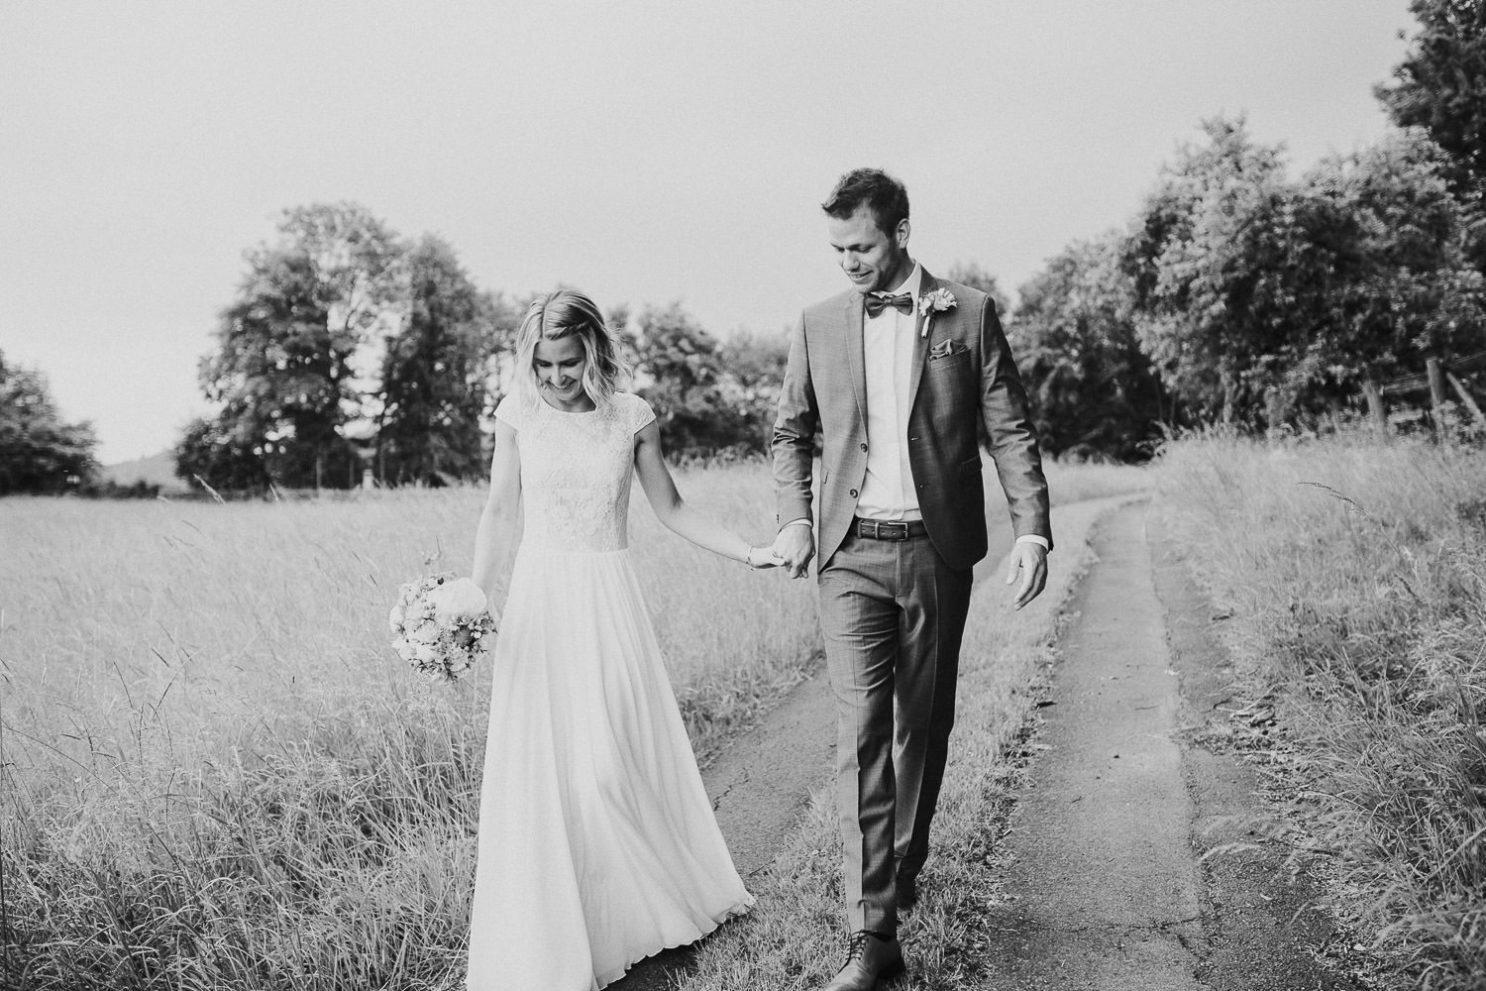 Brautpaar auf Feldweg